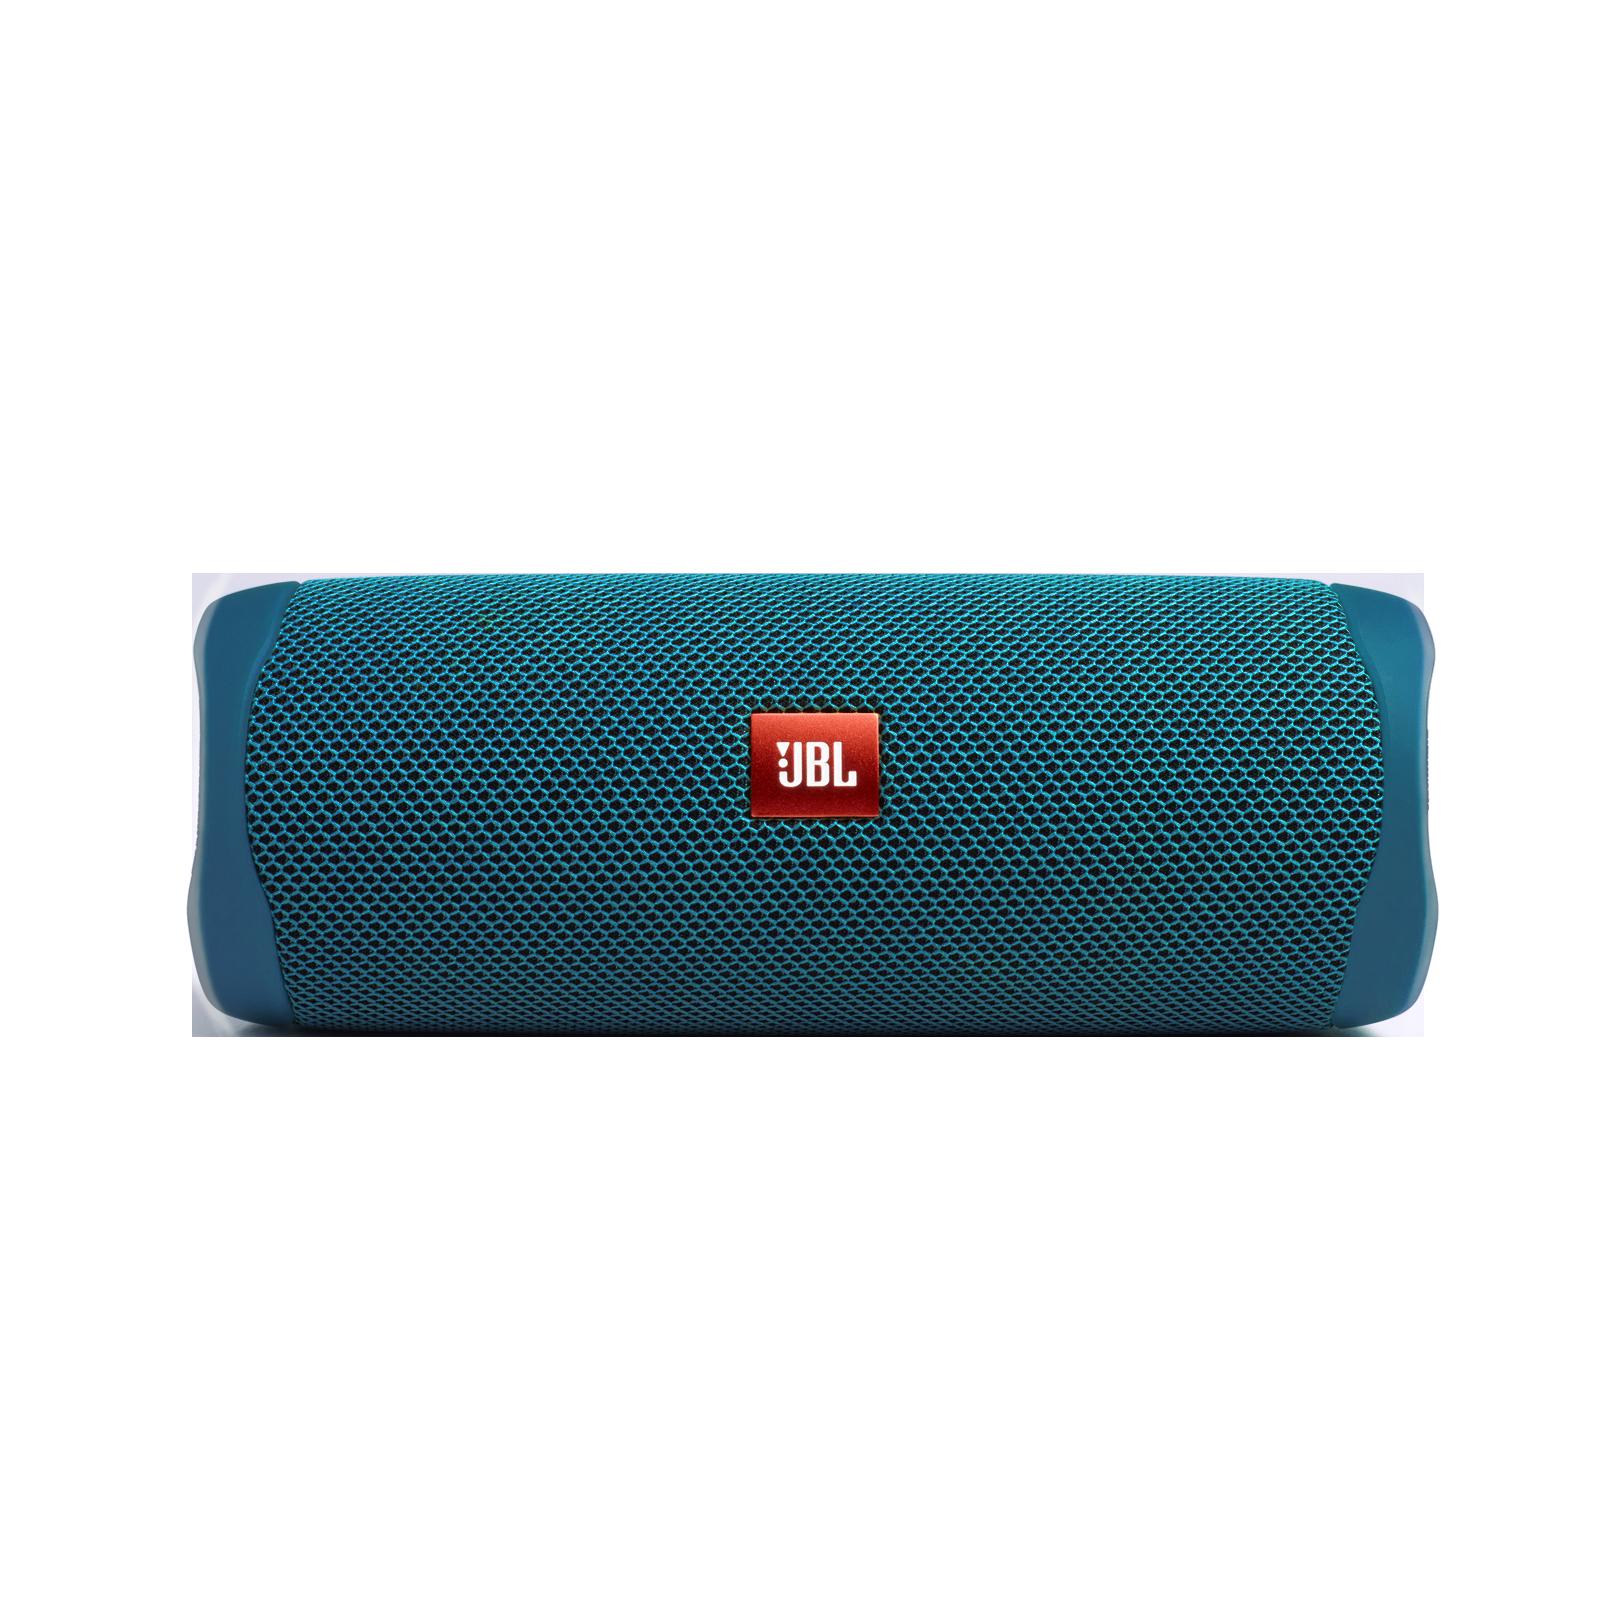 JBL Flip 5 Eco edition - Ocean Blue - Portable Speaker - Eco edition - Front